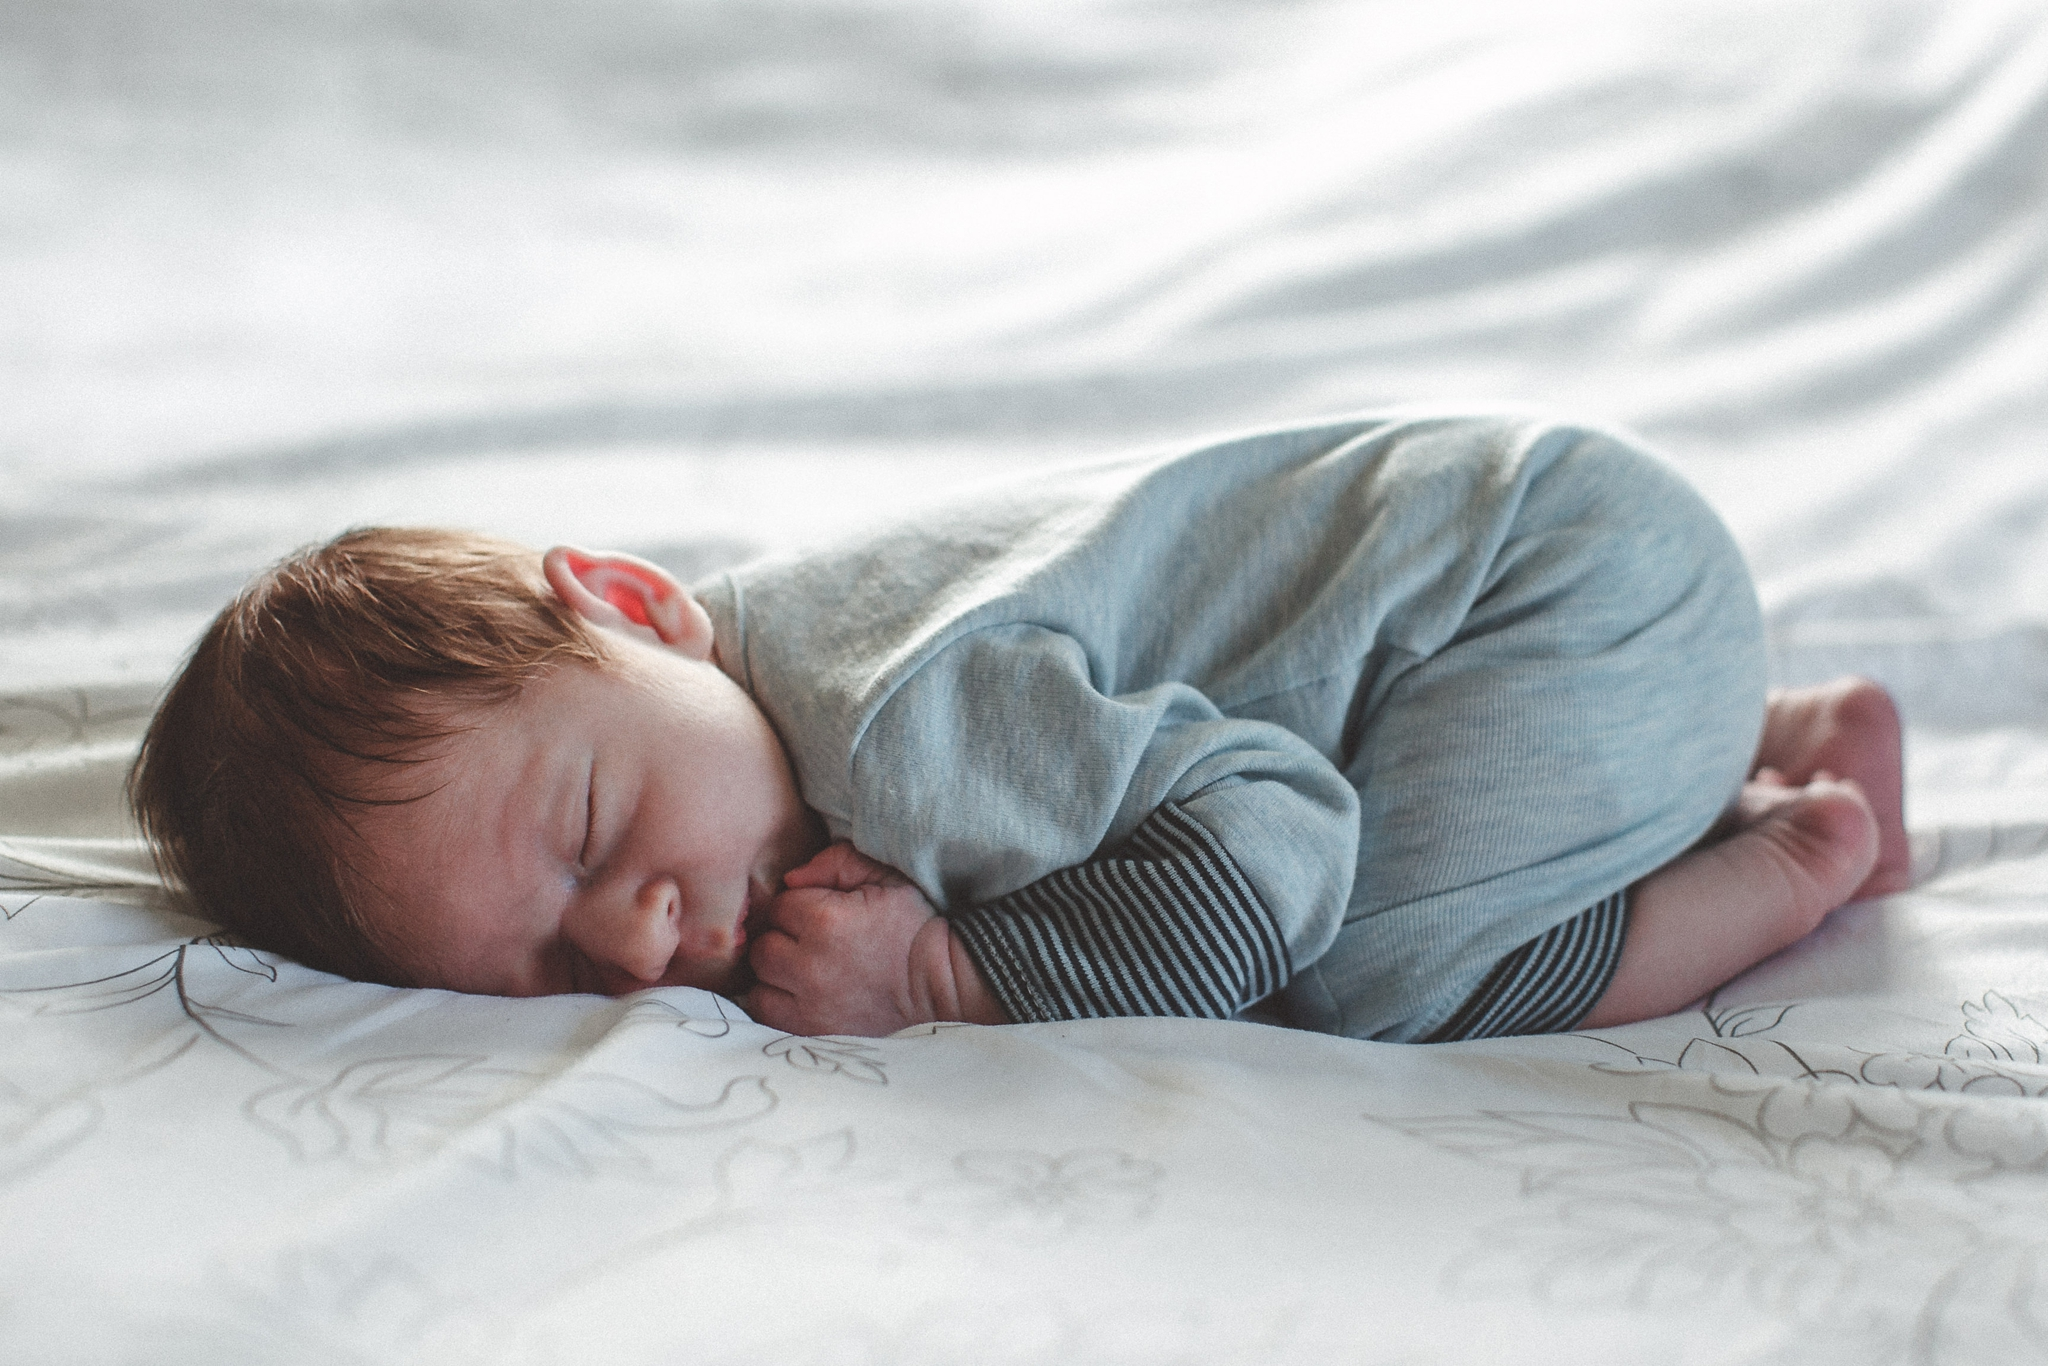 dekalb_il_lifestyle_newborn_photographer_palos_heights_il_0005.jpg